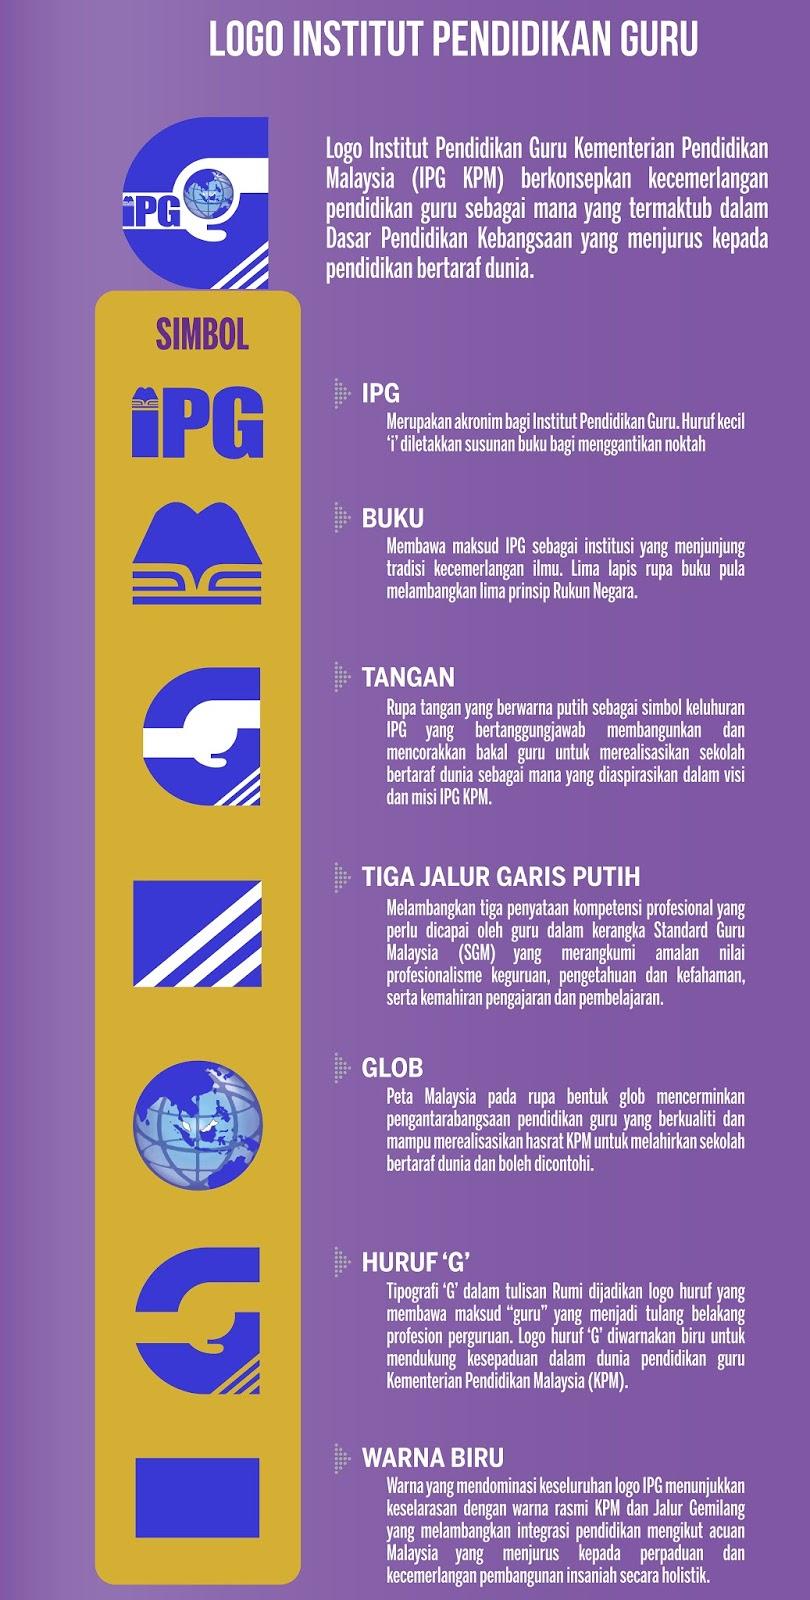 9 Perubahan dalam IPG 2